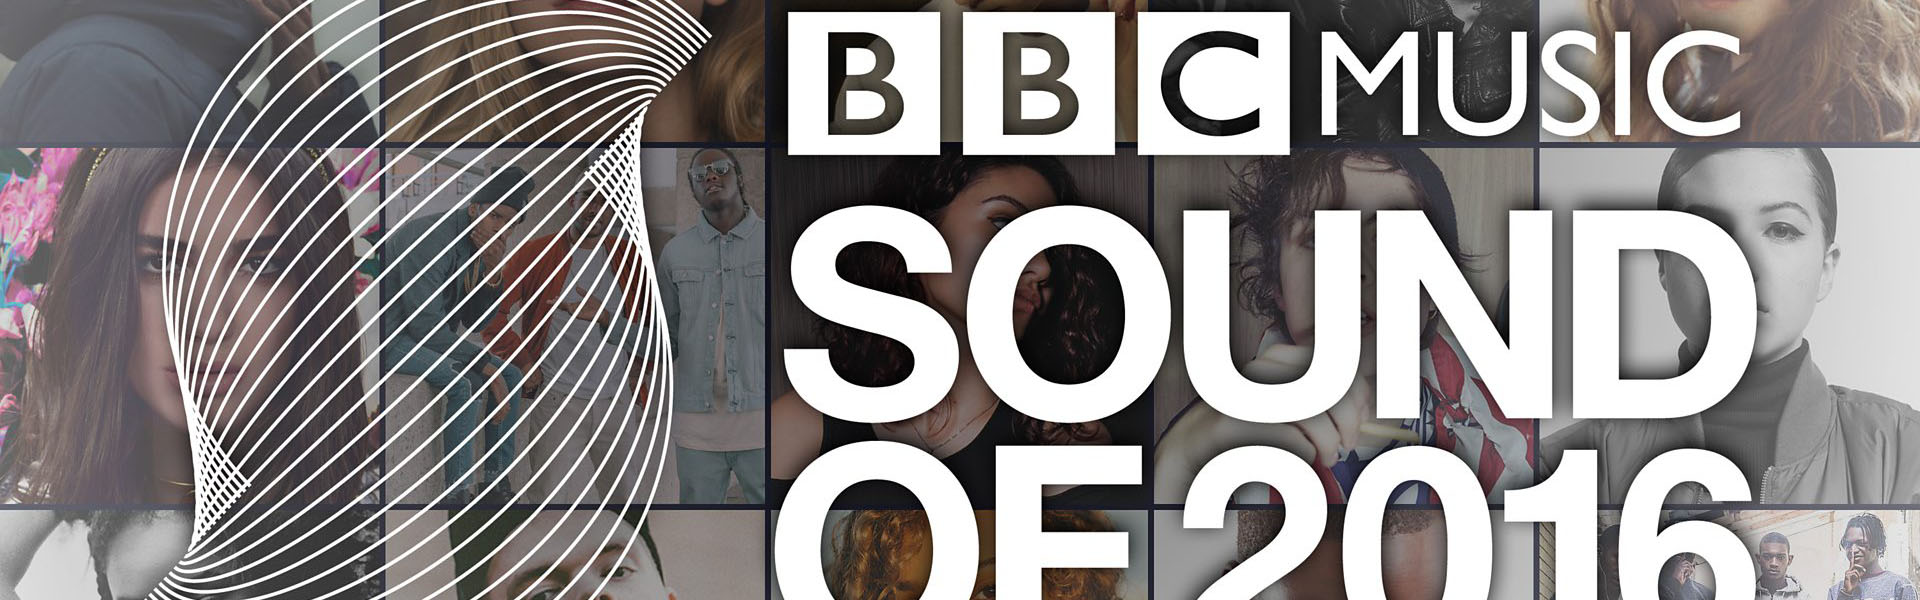 BBC Sound of 2017